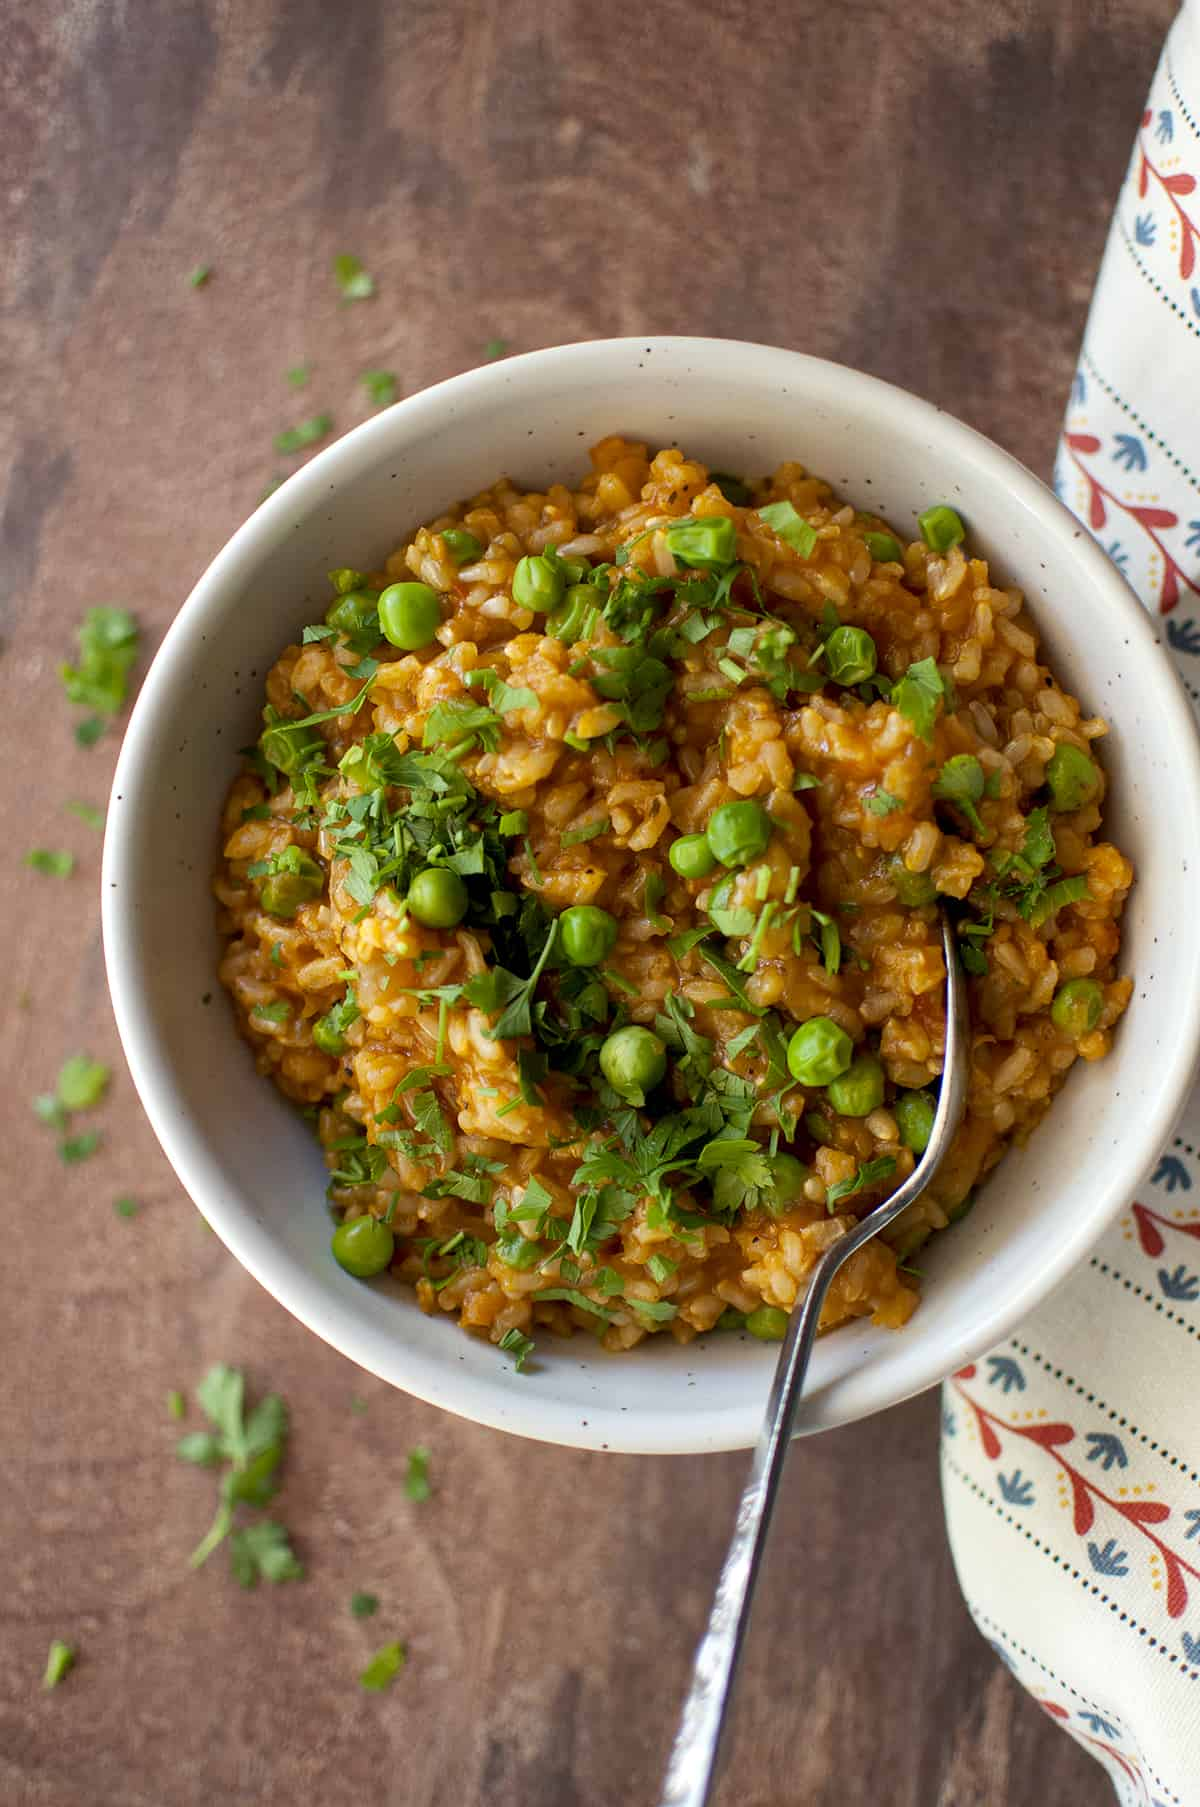 Grey bowl with Jollof rice